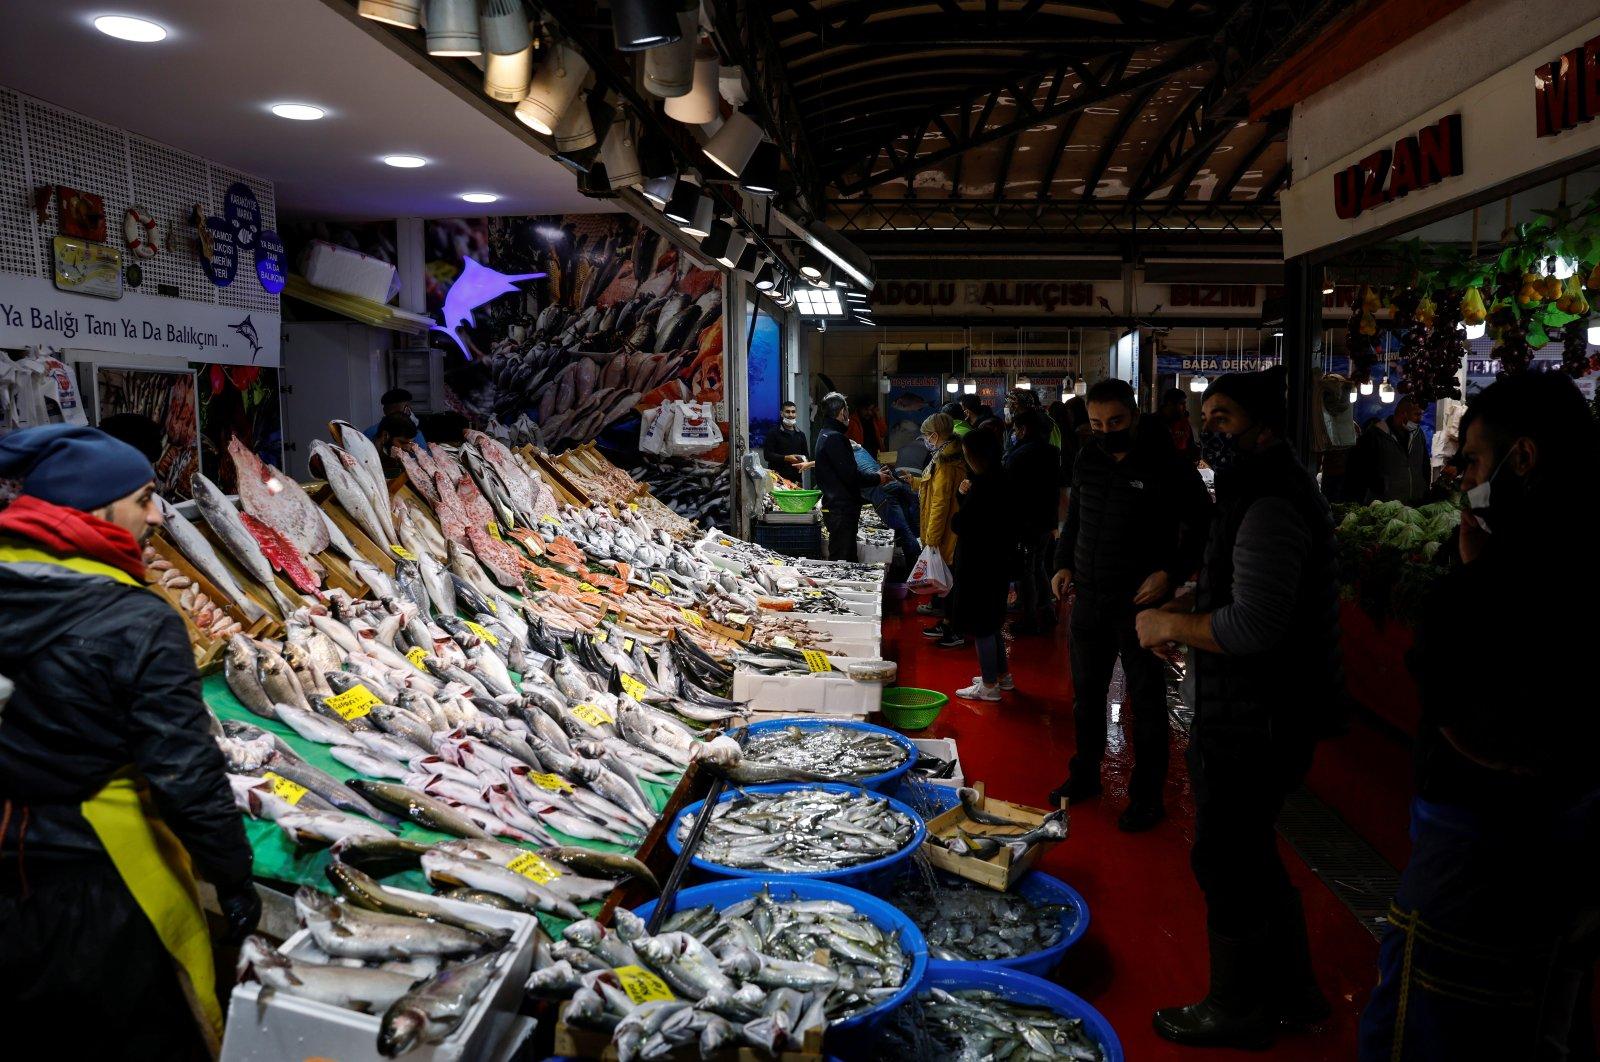 People shop at a fish market in Istanbul's Karaköy district, Turkey, Jan. 8, 2021. (Reuters Photo)